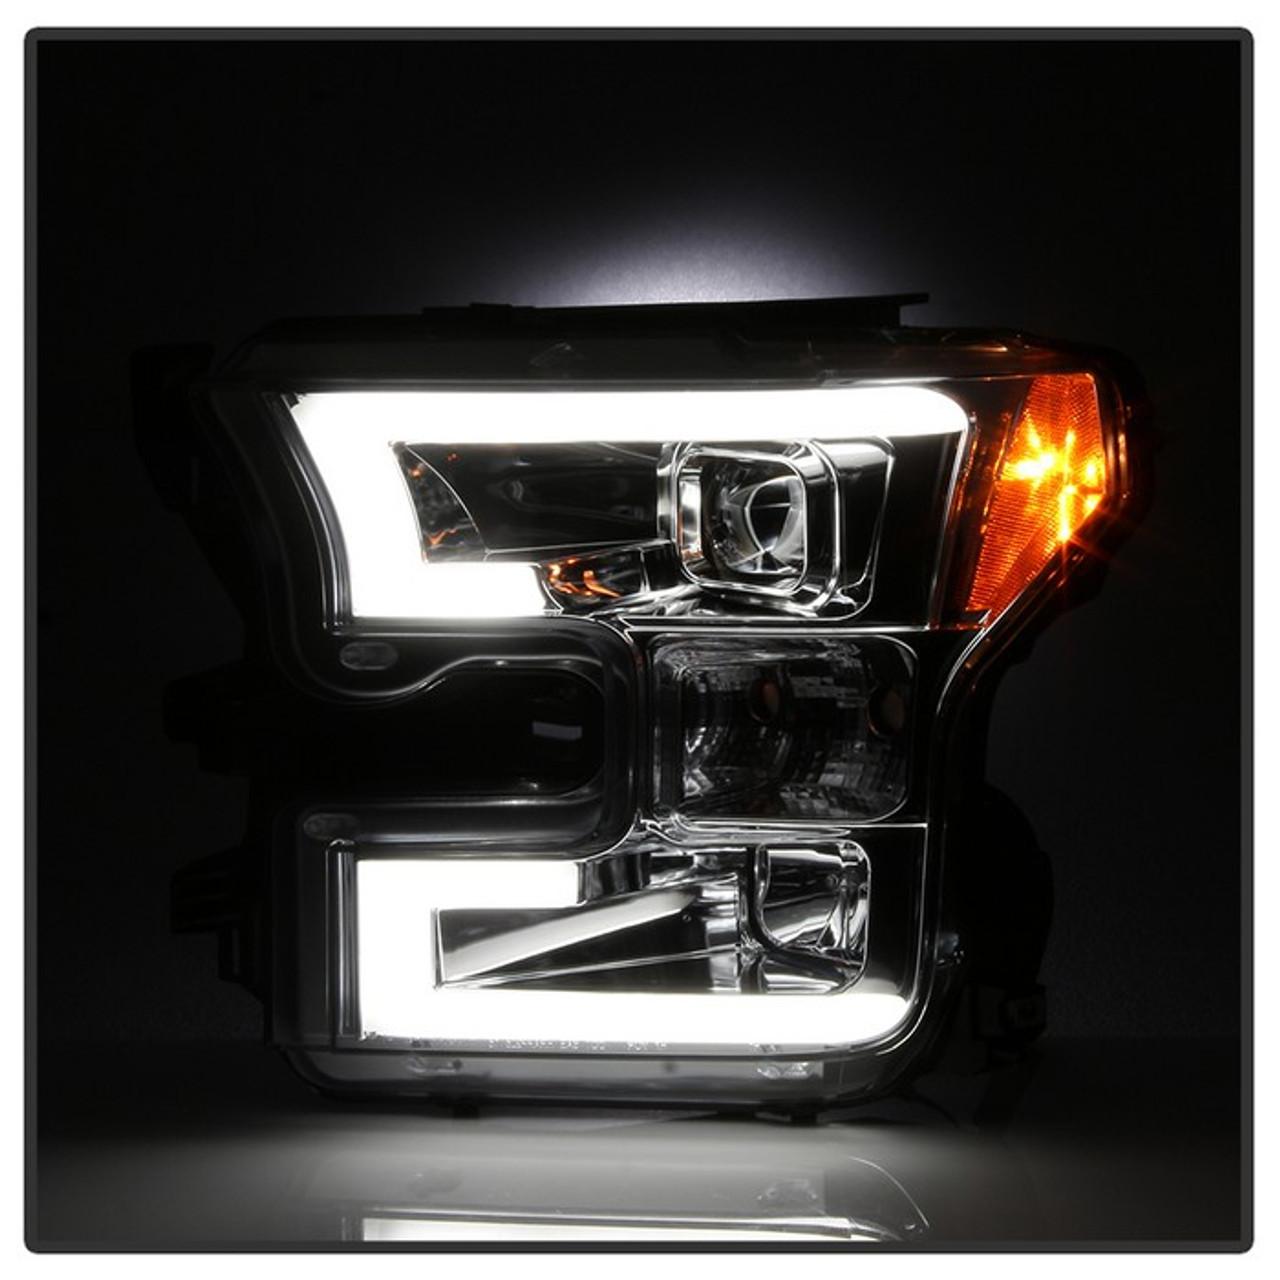 Spyder 2015-2017 Ford F-150 LED Light Bar Projector Headlights (Chrome)